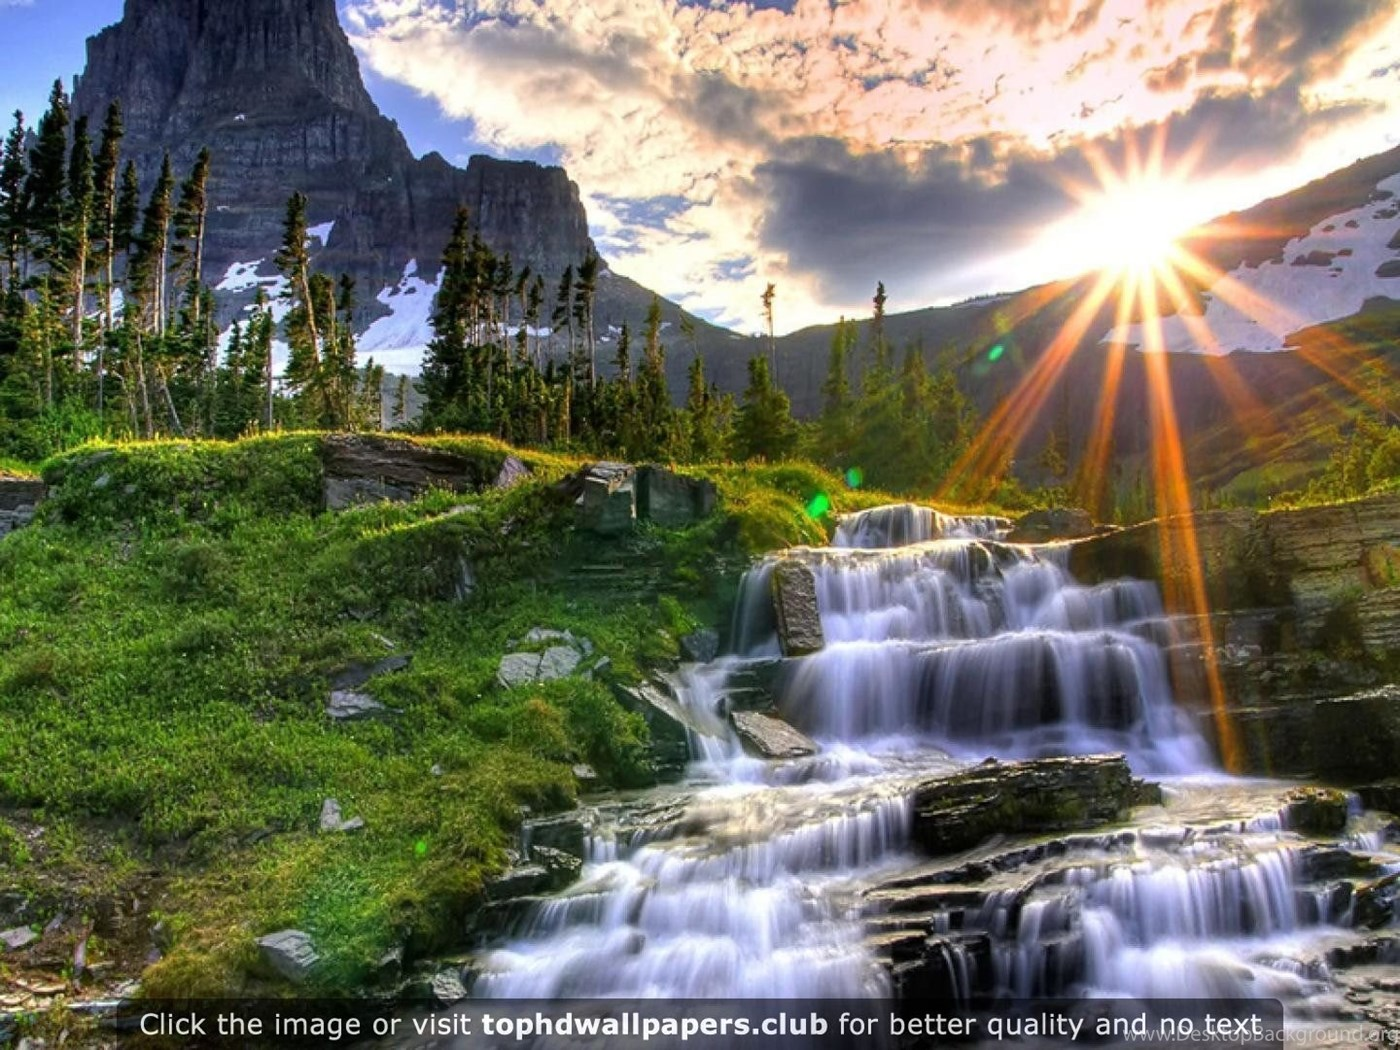 Full Hd 1080p Nature S Desktop Backgrounds Hd 4k Or Hd Wallpapers Desktop Background